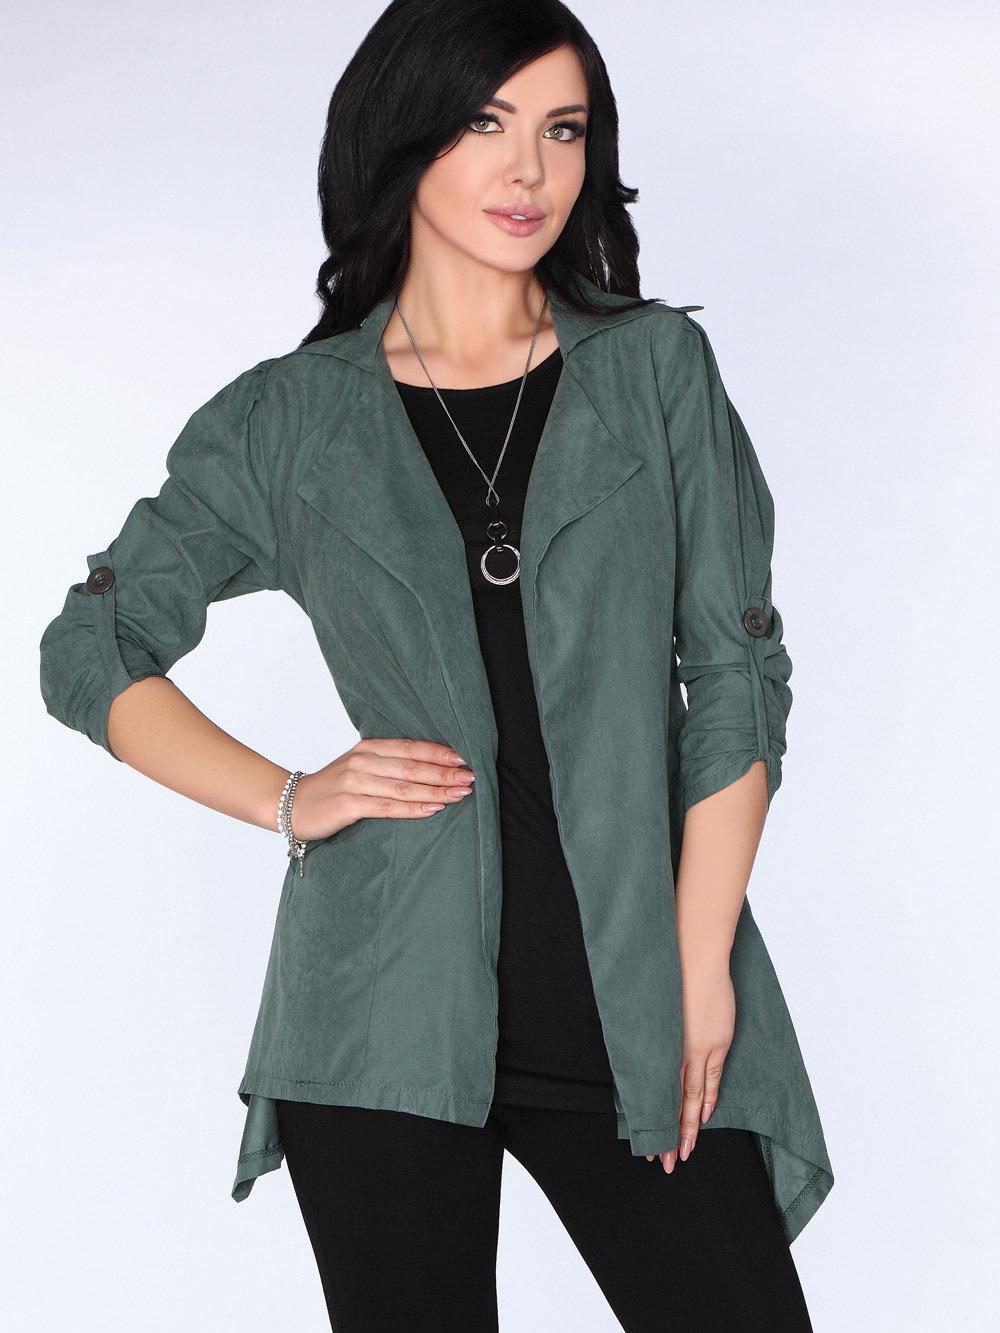 Merribel Cardigan CG026 Dark Green Verde